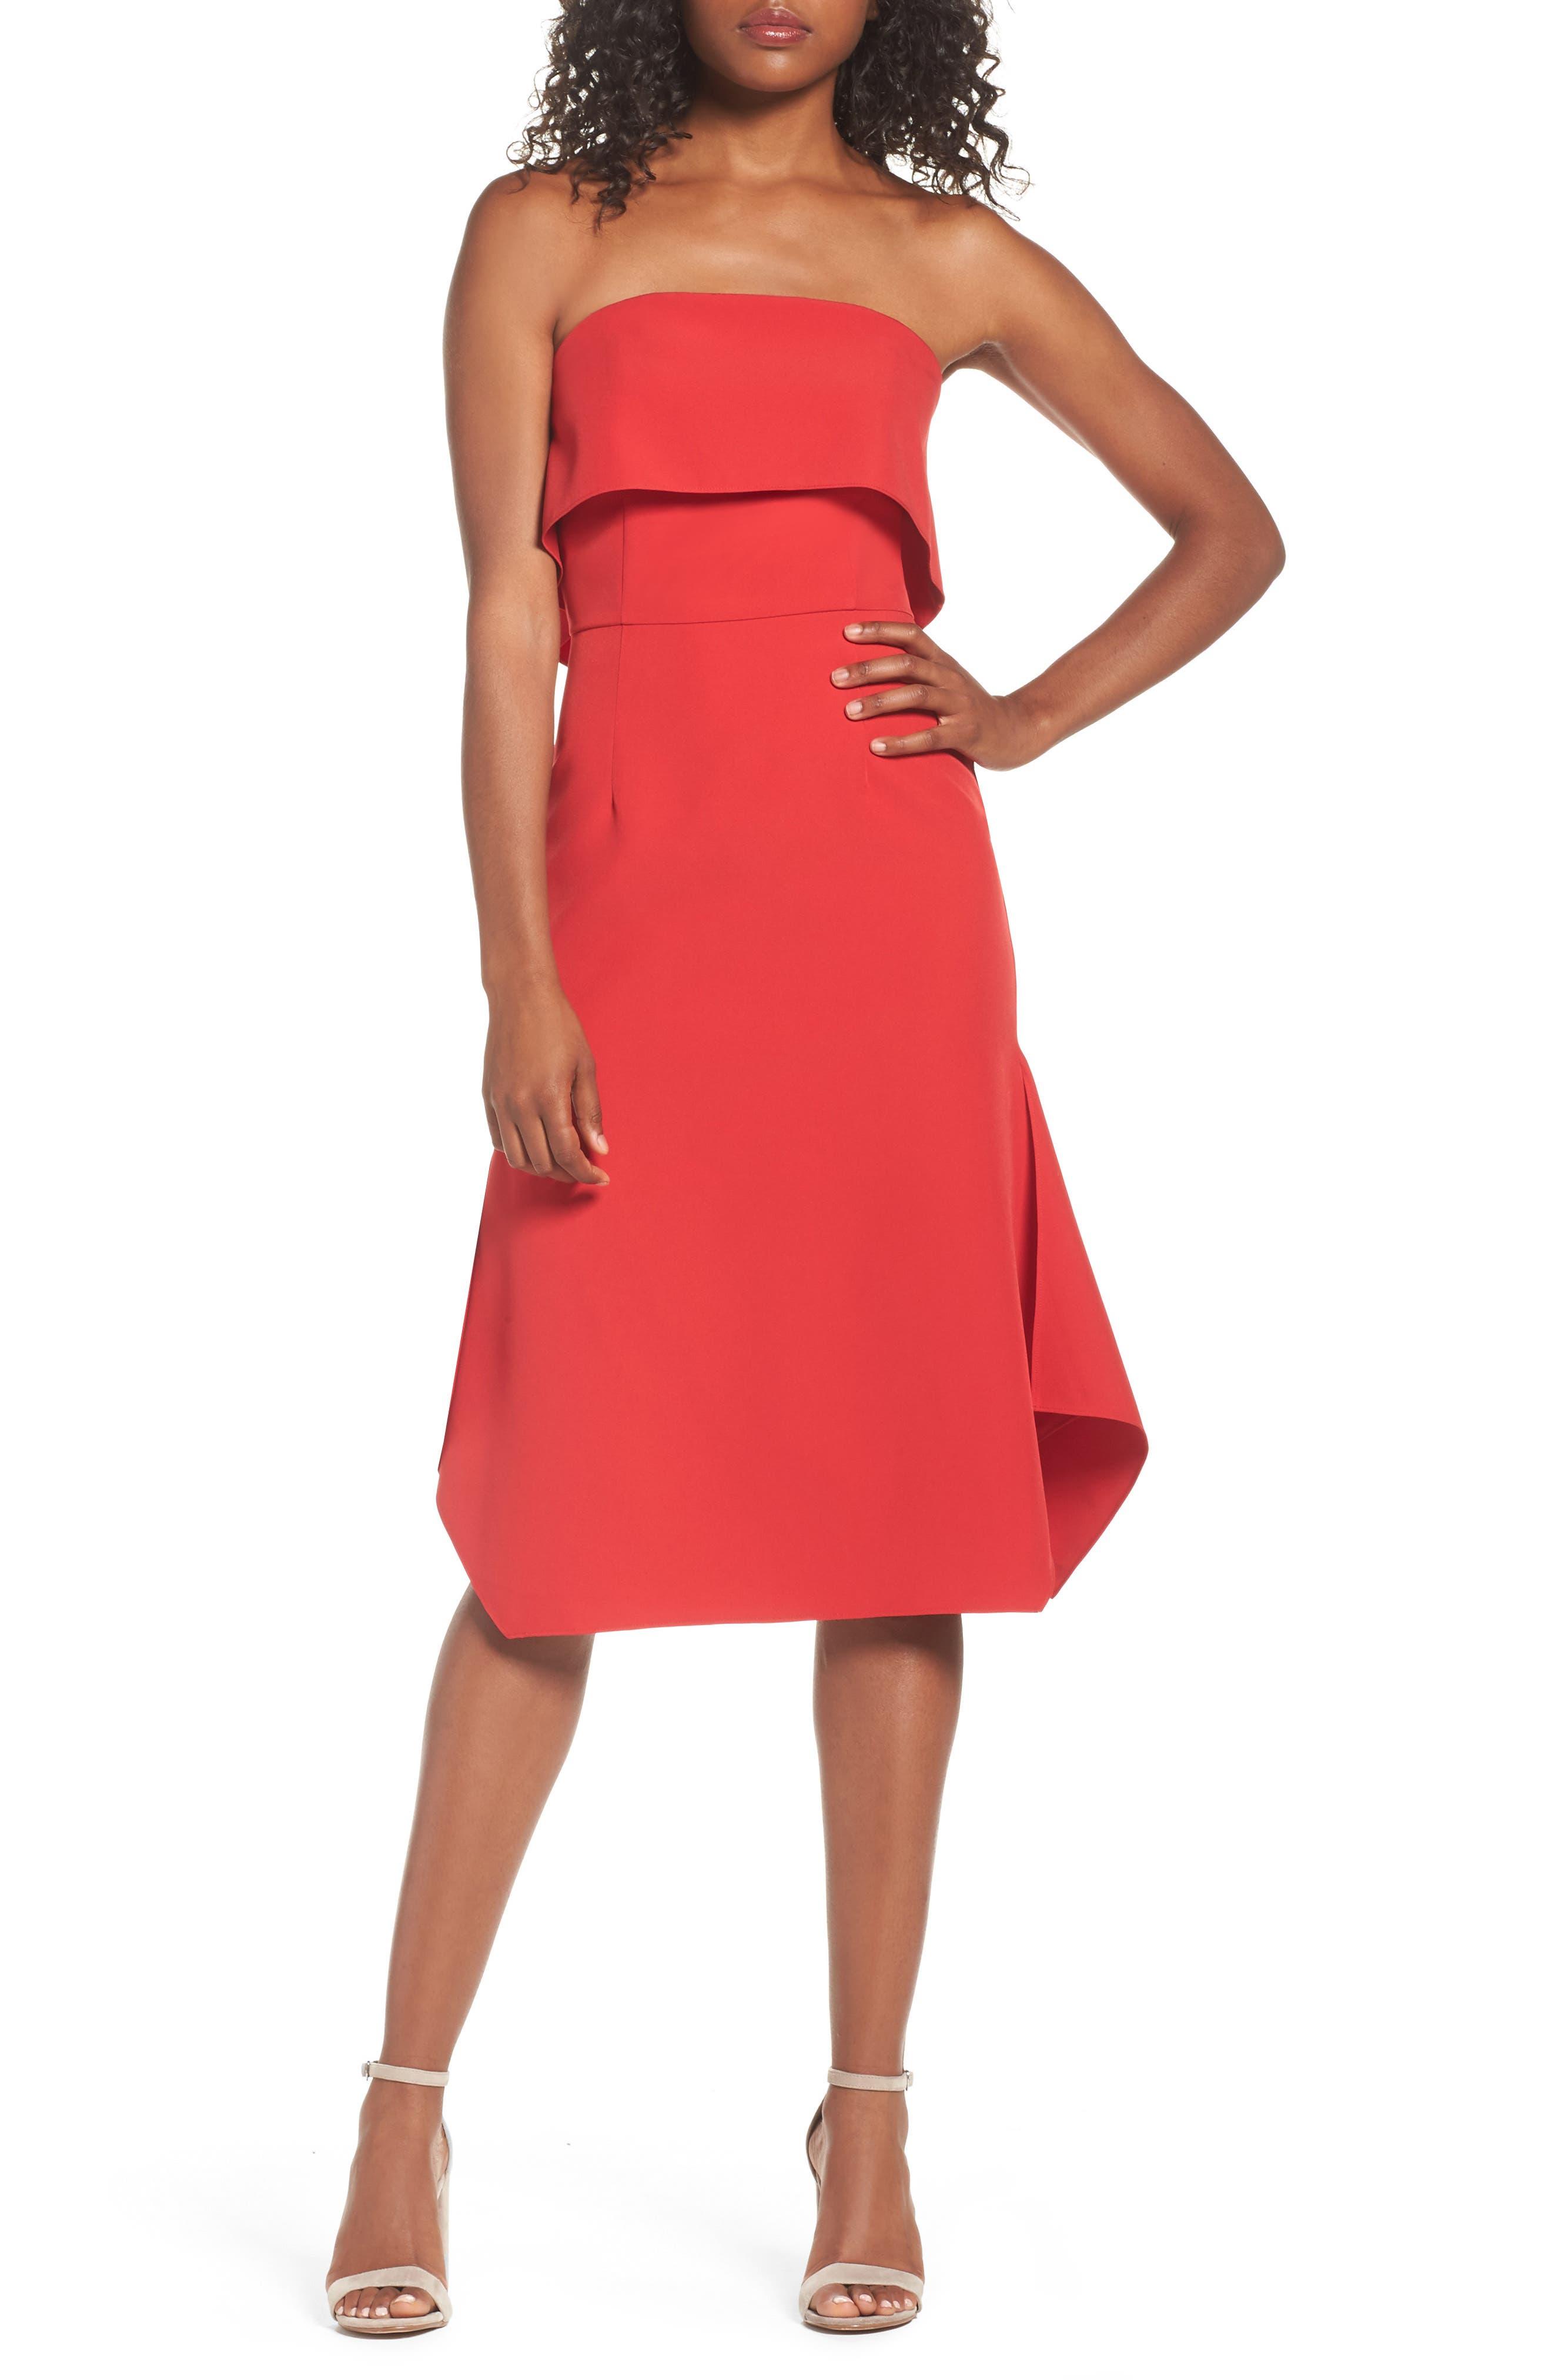 Alternate Image 1 Selected - Chelsea28 Aurora Rose Crepe Popover Dress